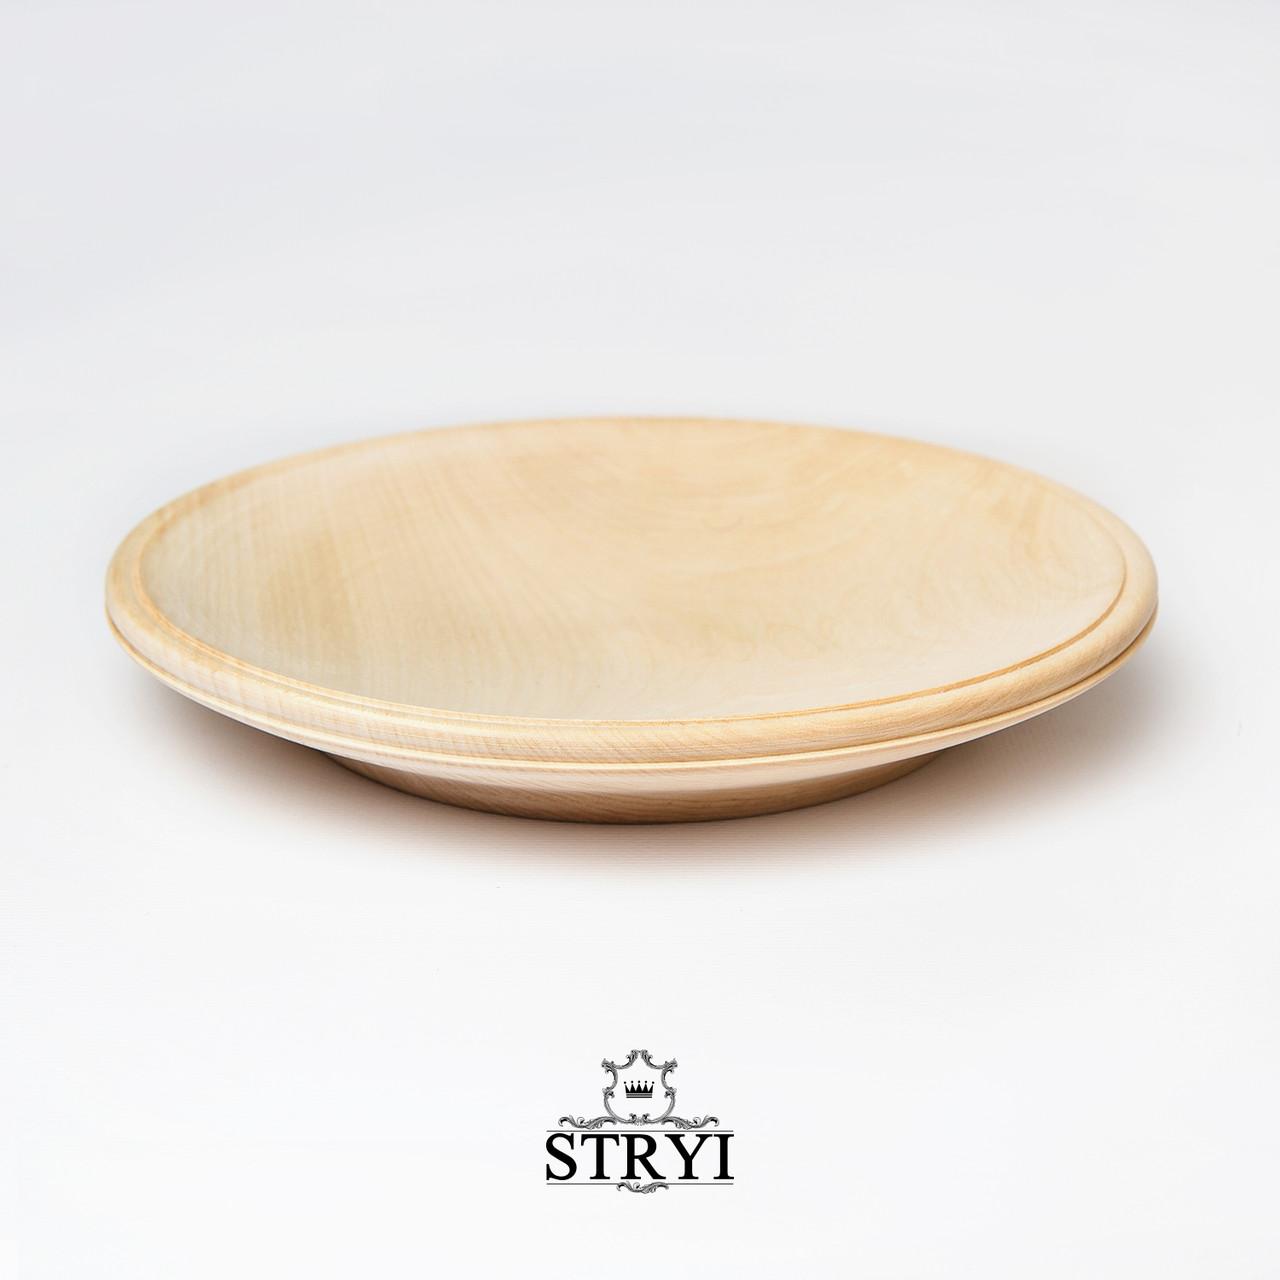 Тарелка, липовая заготовка для резьбы, 240 мм